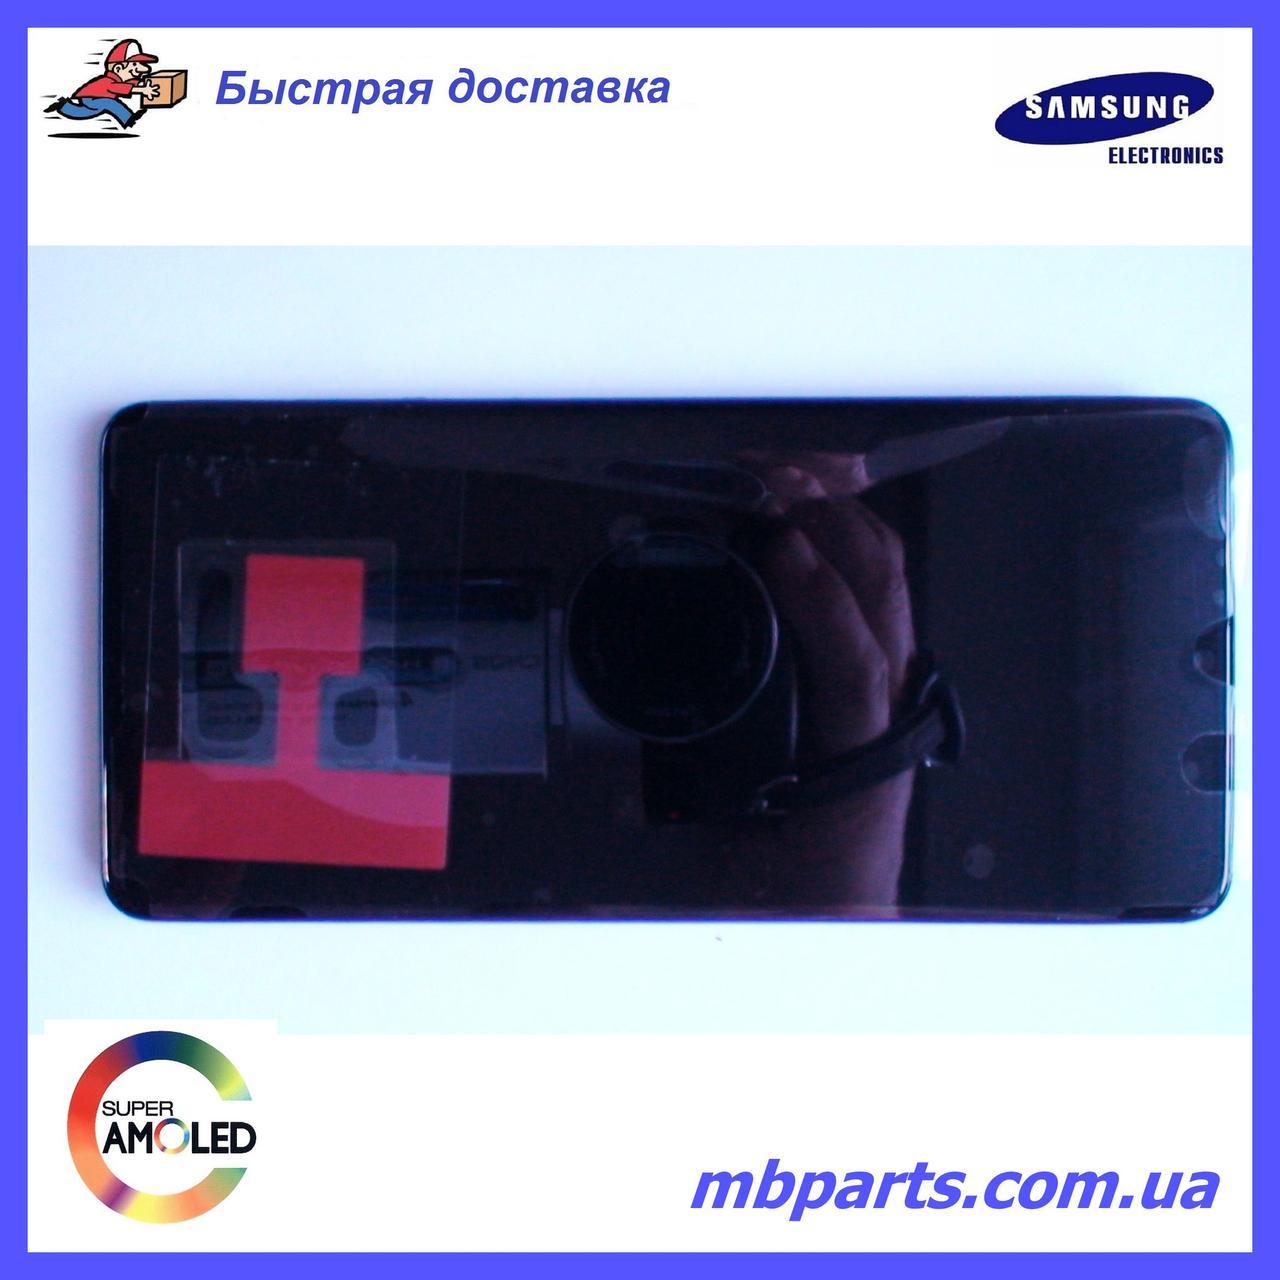 Дисплей с сенсором Samsung А415 Galaxy А41 Black, GH82-22860A, оригинал с рамкой!